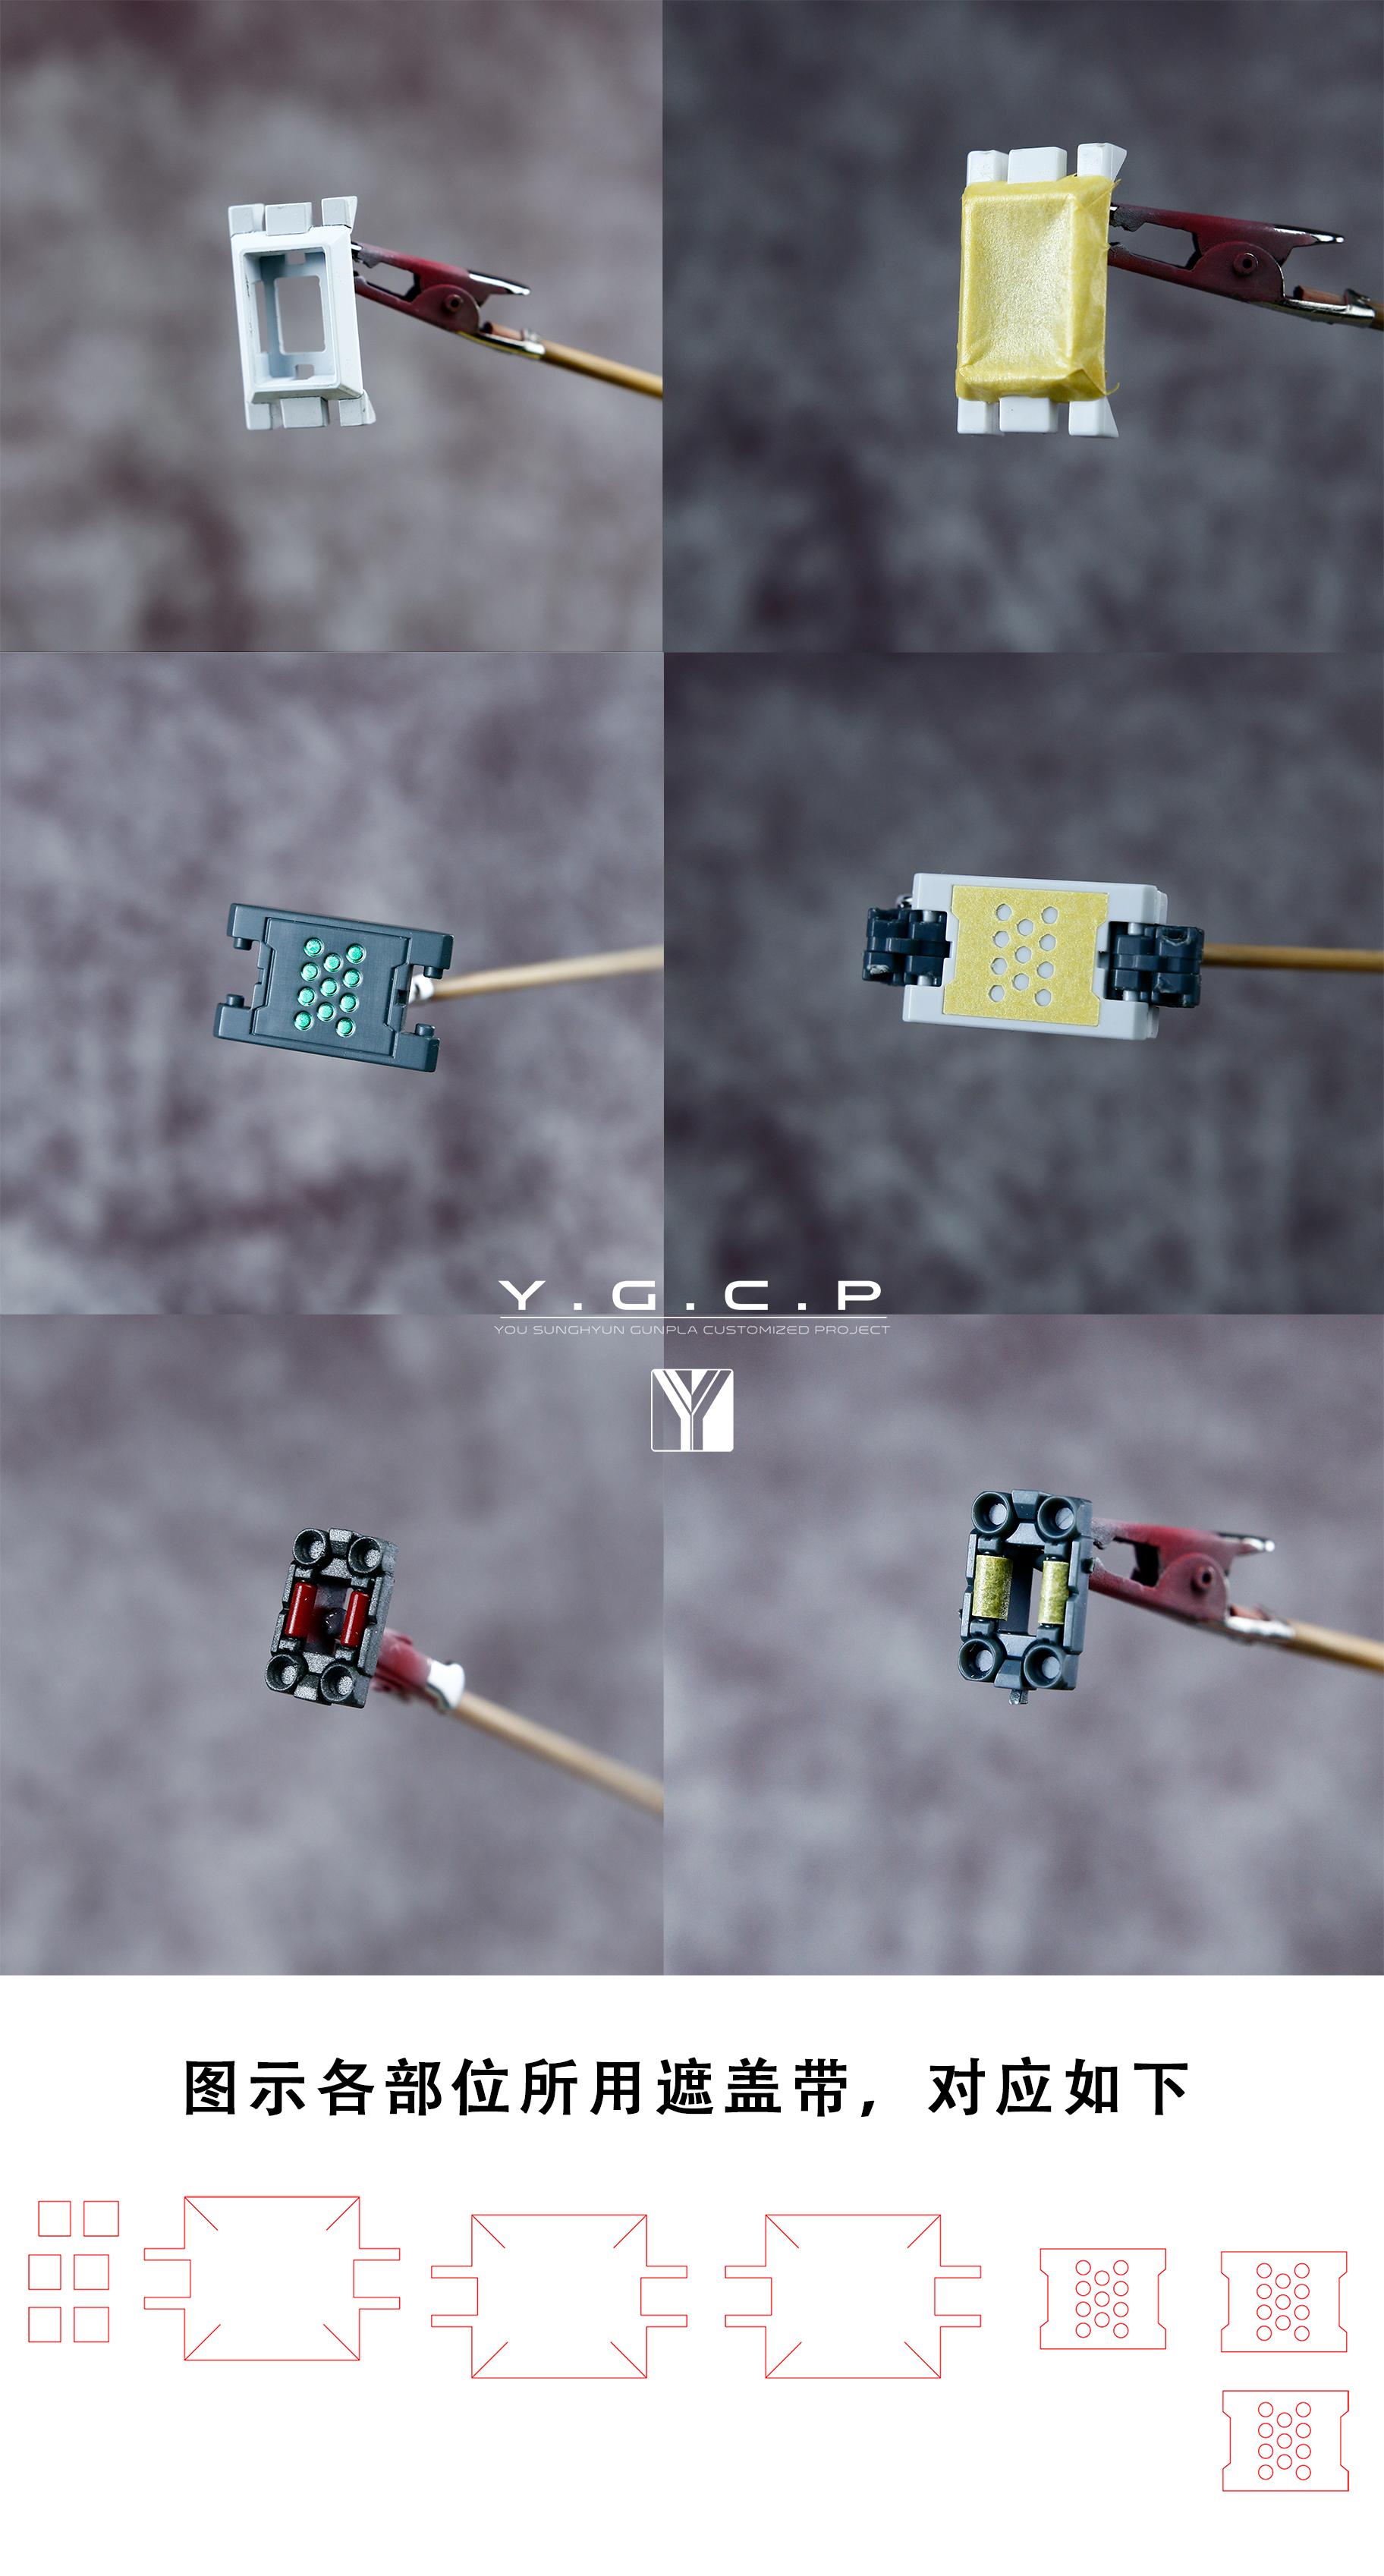 G825_YGCP_mg_yujiaoland_masking_tape_nu_008.jpg